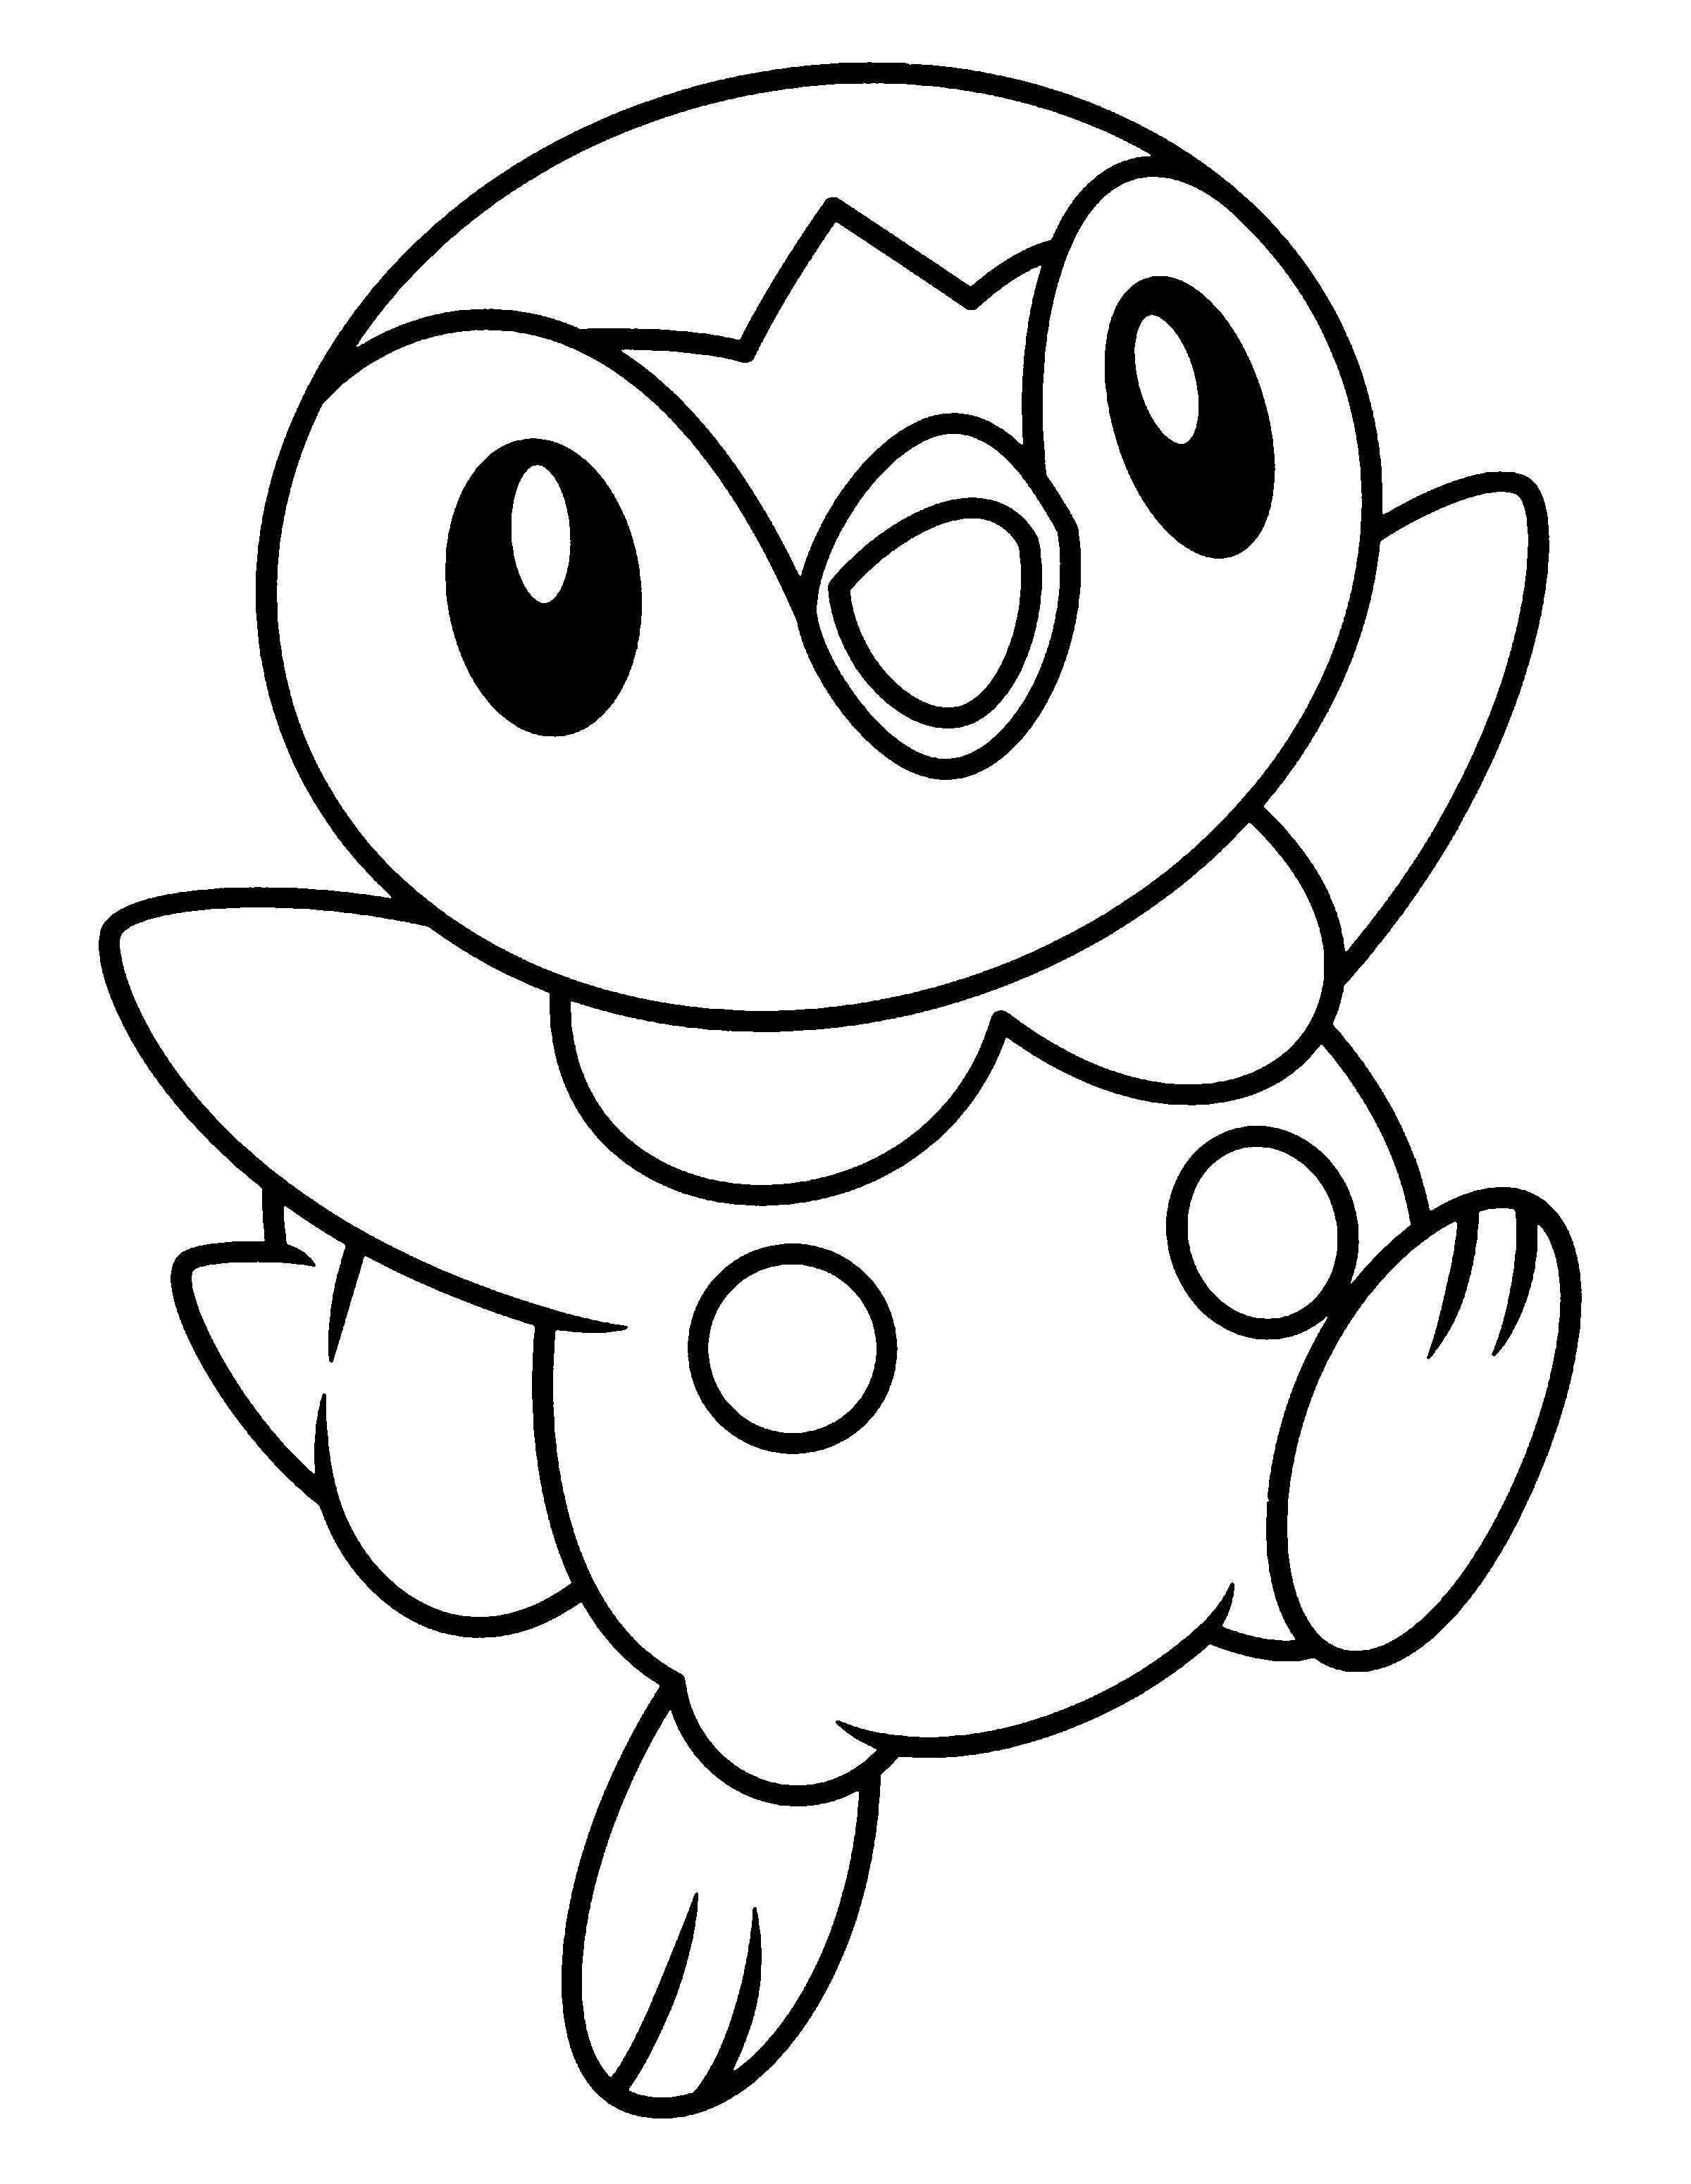 Pokemonkleurplaten Piplup Http Www Pokemon Kleurplaat Nl Kleurplaten Piplup Piplup 6 Html Kleurplaten Pokemon Kleuren